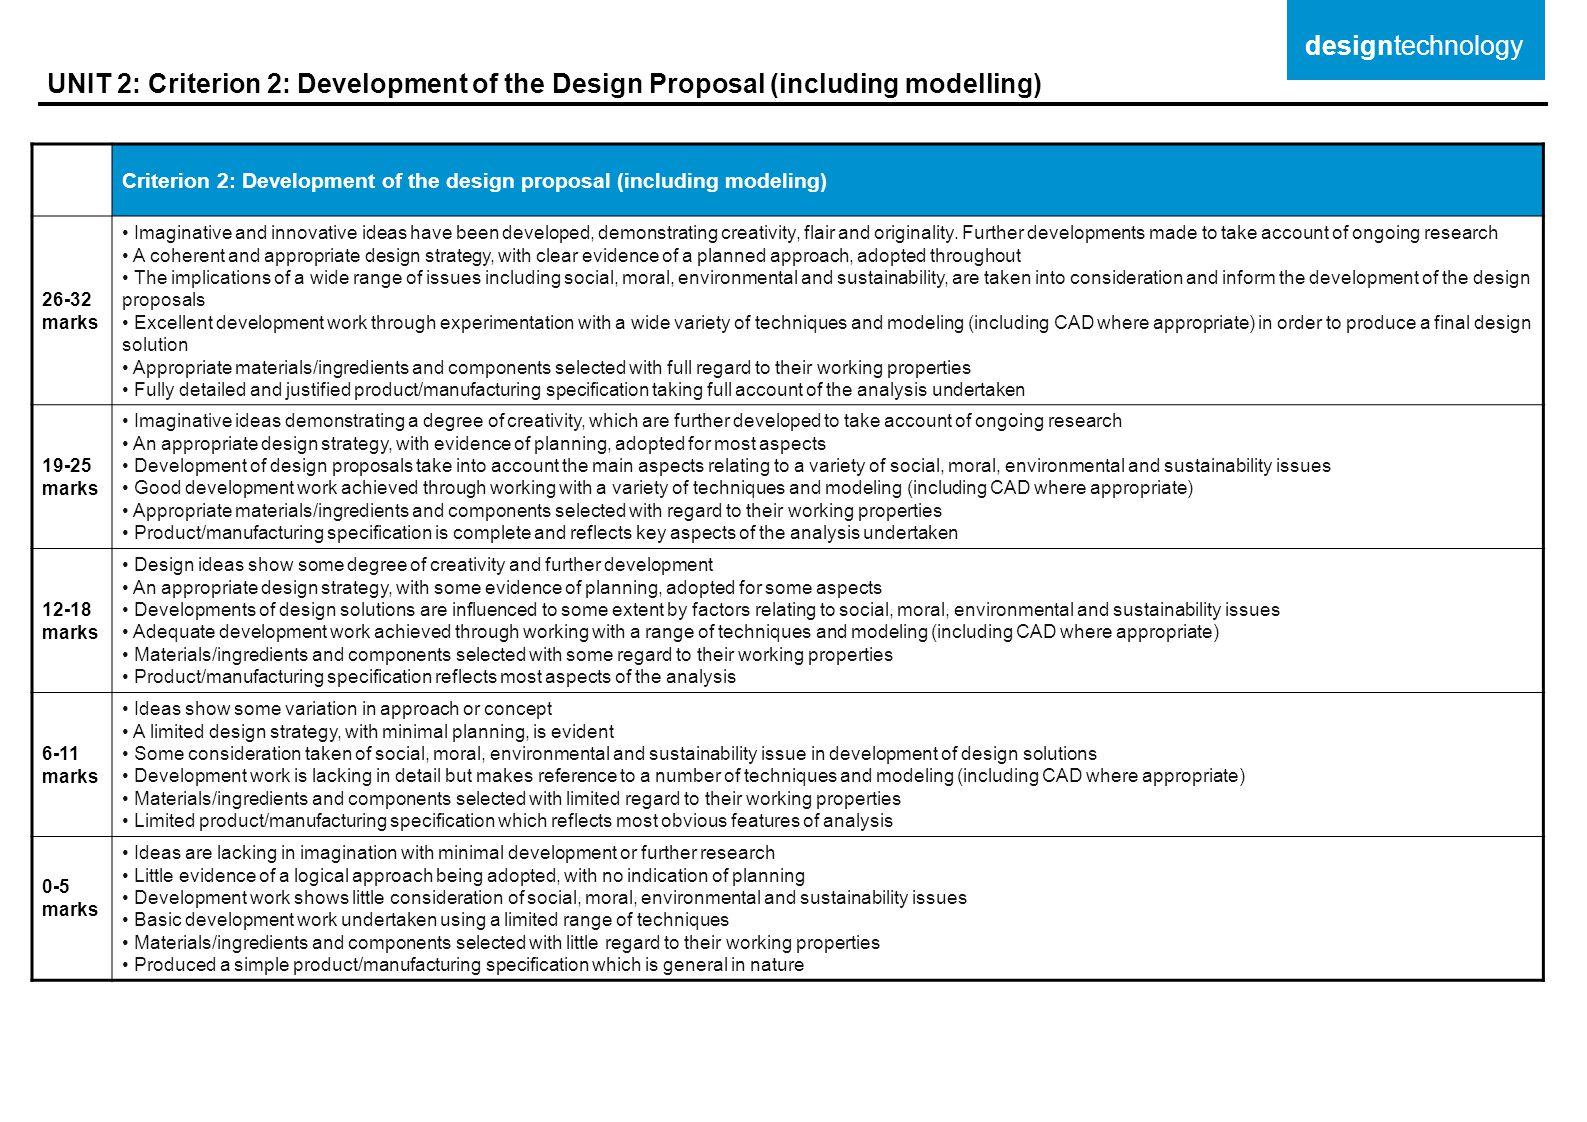 UNIT 2: Criterion 2: Development of the Design Proposal (including modelling) Criterion 2: Development of the design proposal (including modeling) 26-